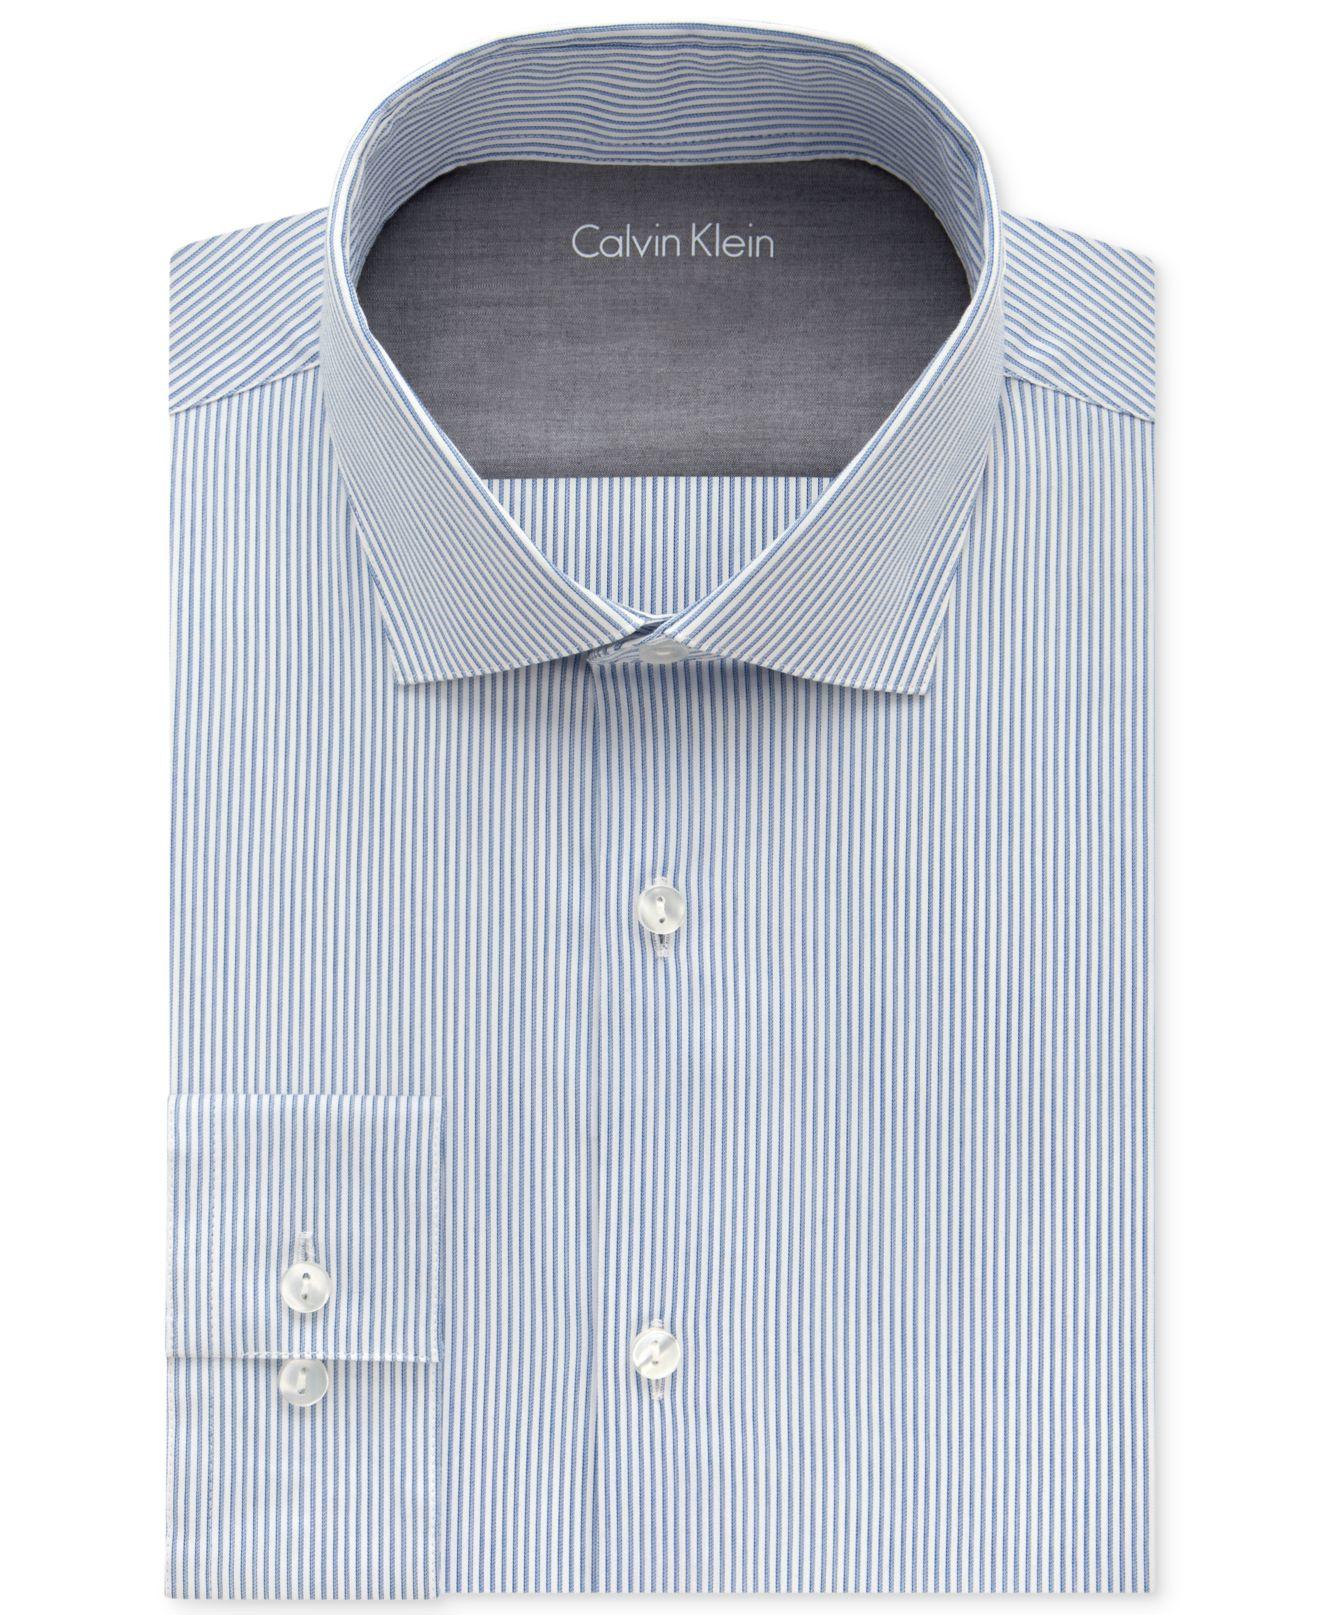 Calvin klein men 39 s x extra slim fit empire blue striped for Calvin klein x fit dress shirt